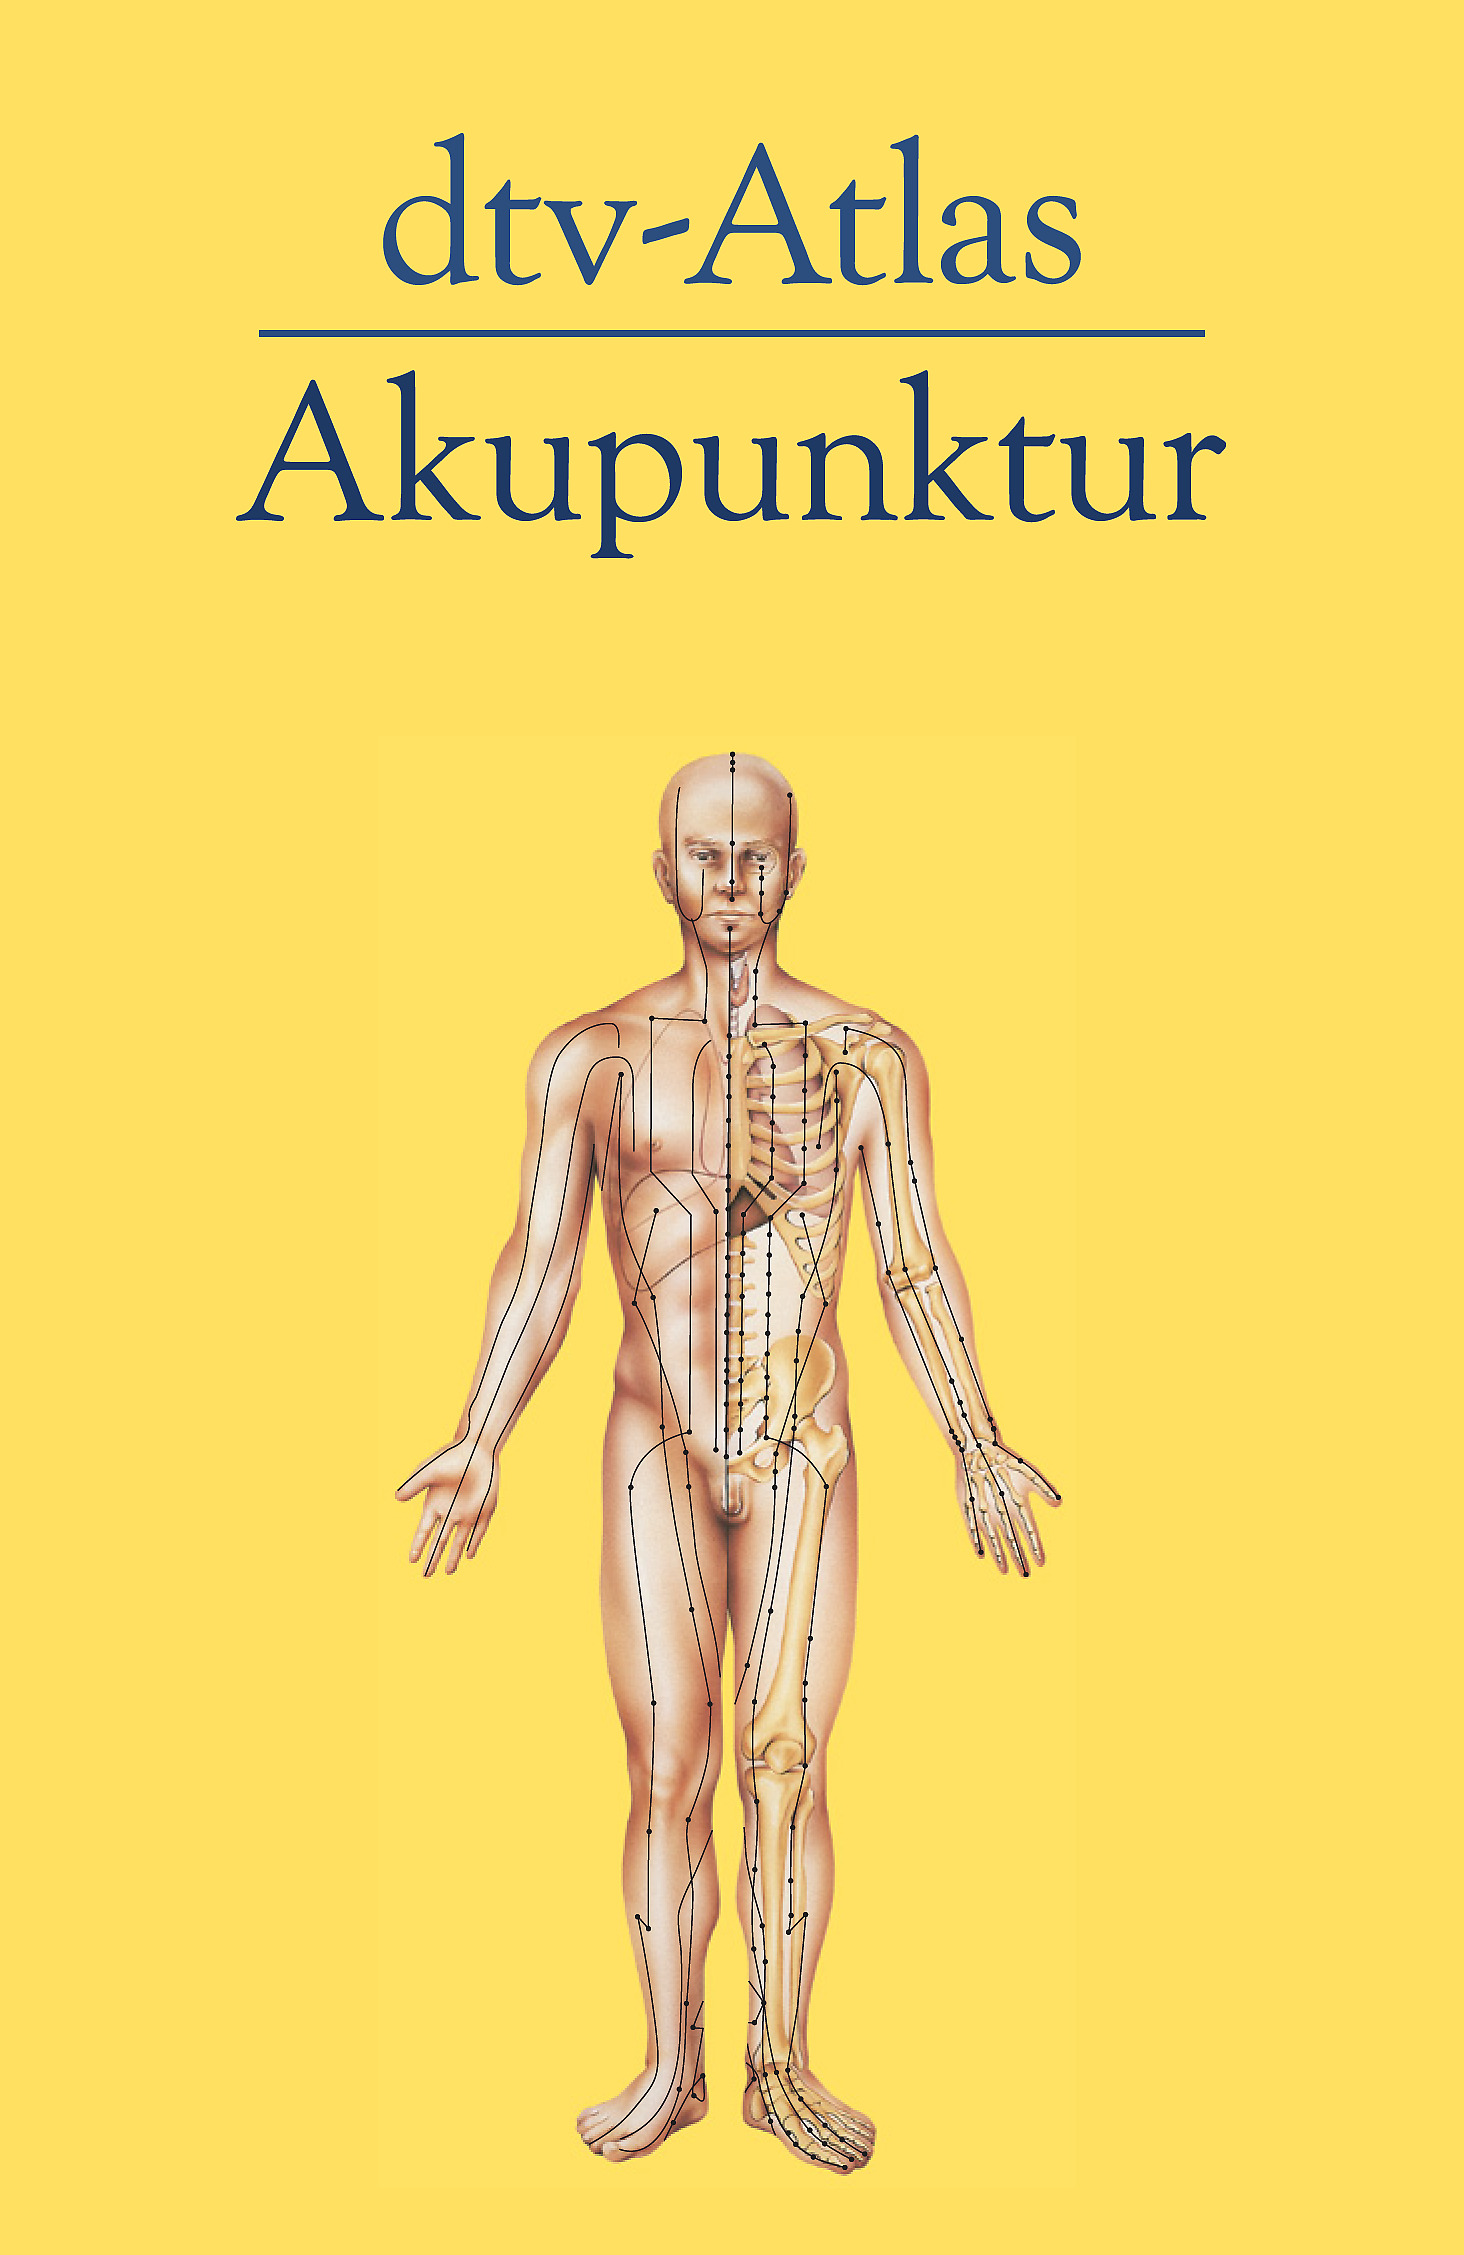 dtv - Atlas Akupunktur